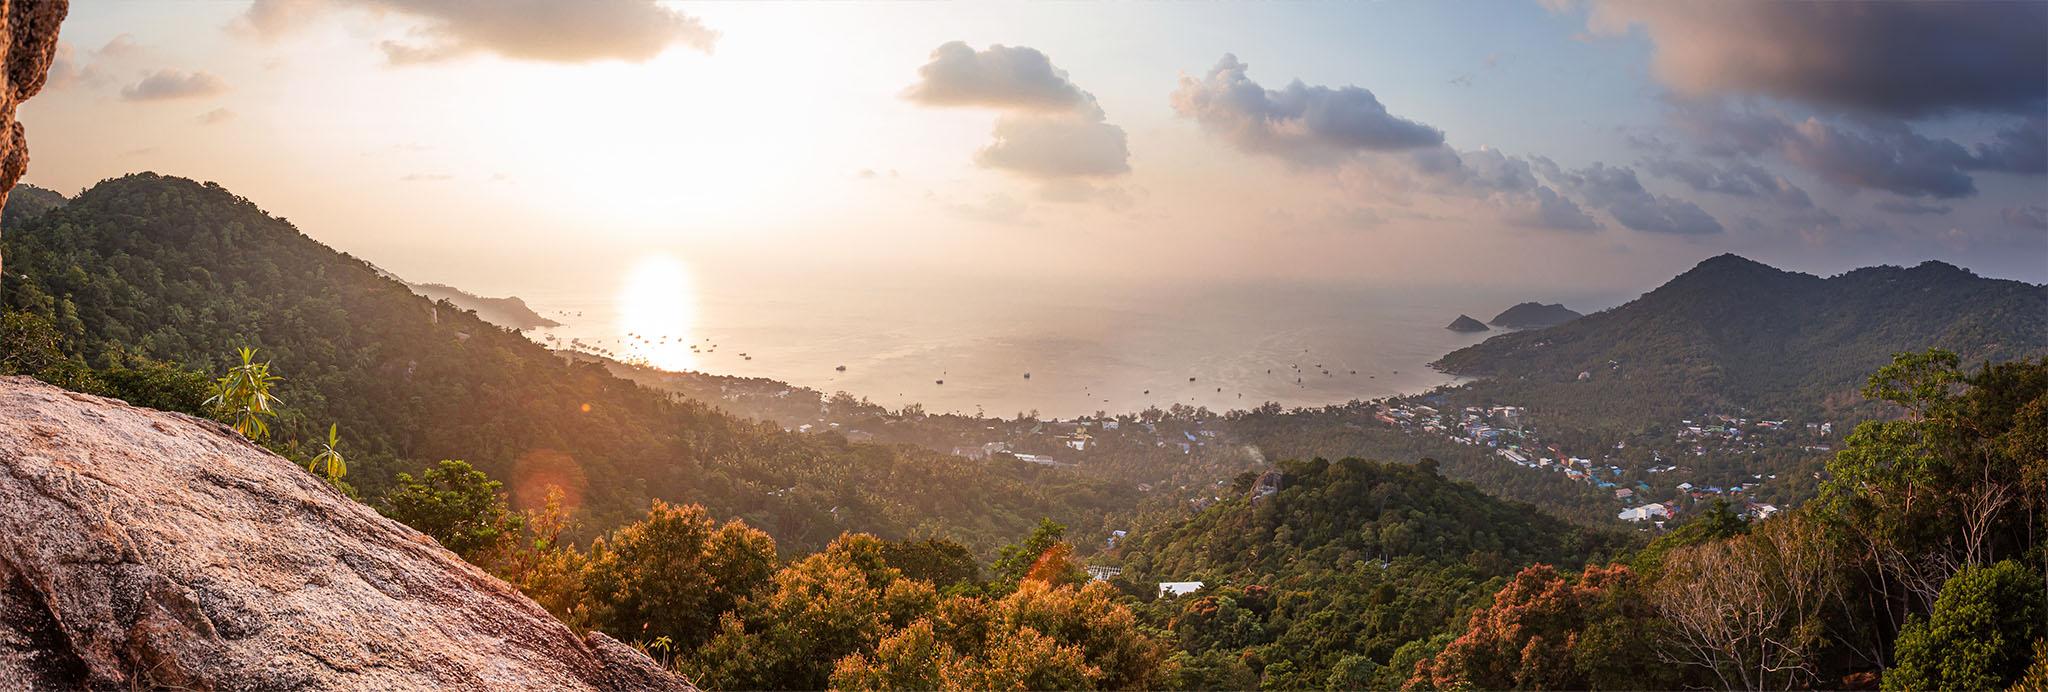 Koh Tao Two View จุดชมวิวเกาะเต่า